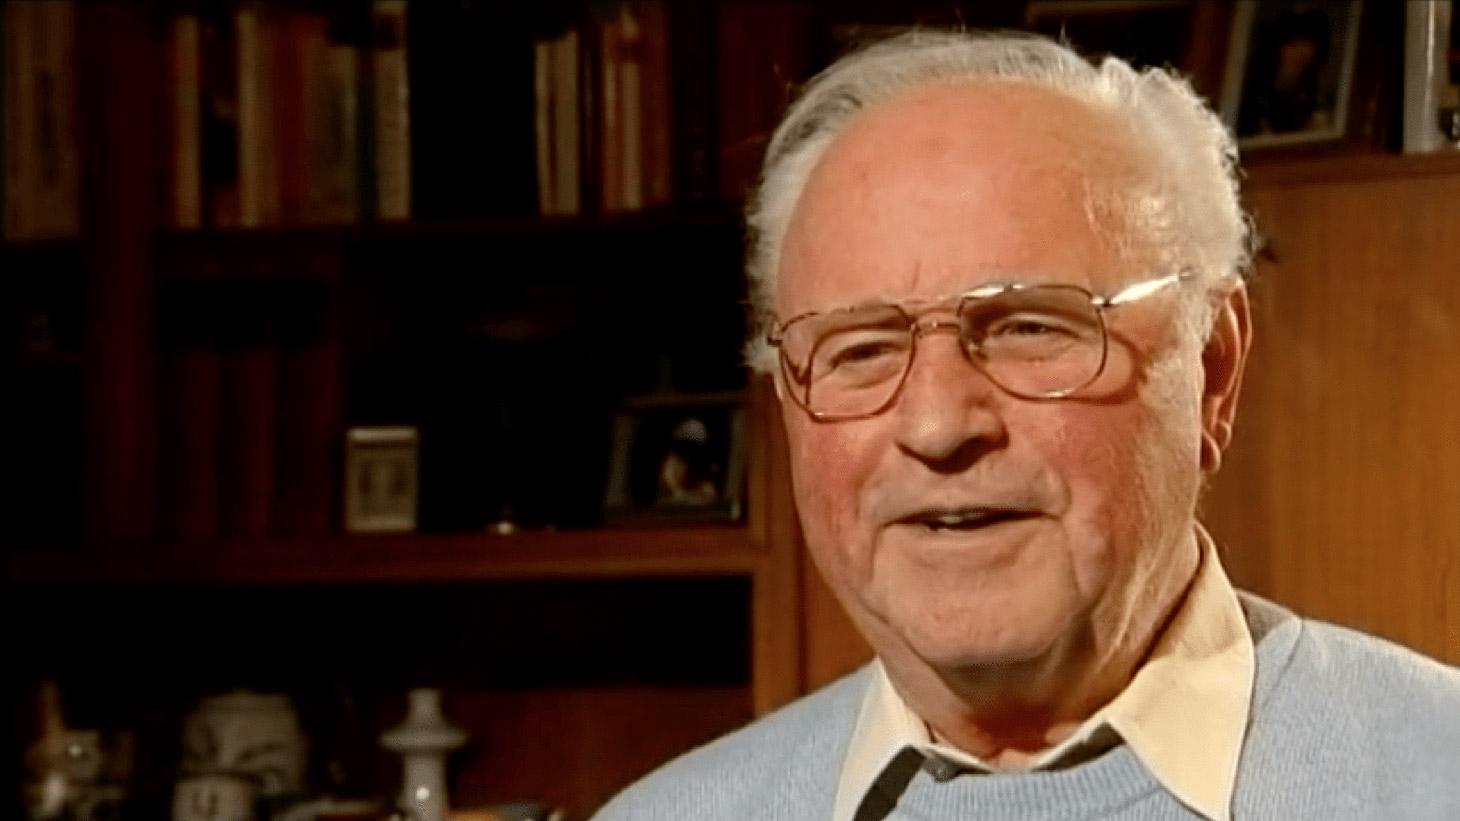 Zeitzeugeninterview Heinz Radloff